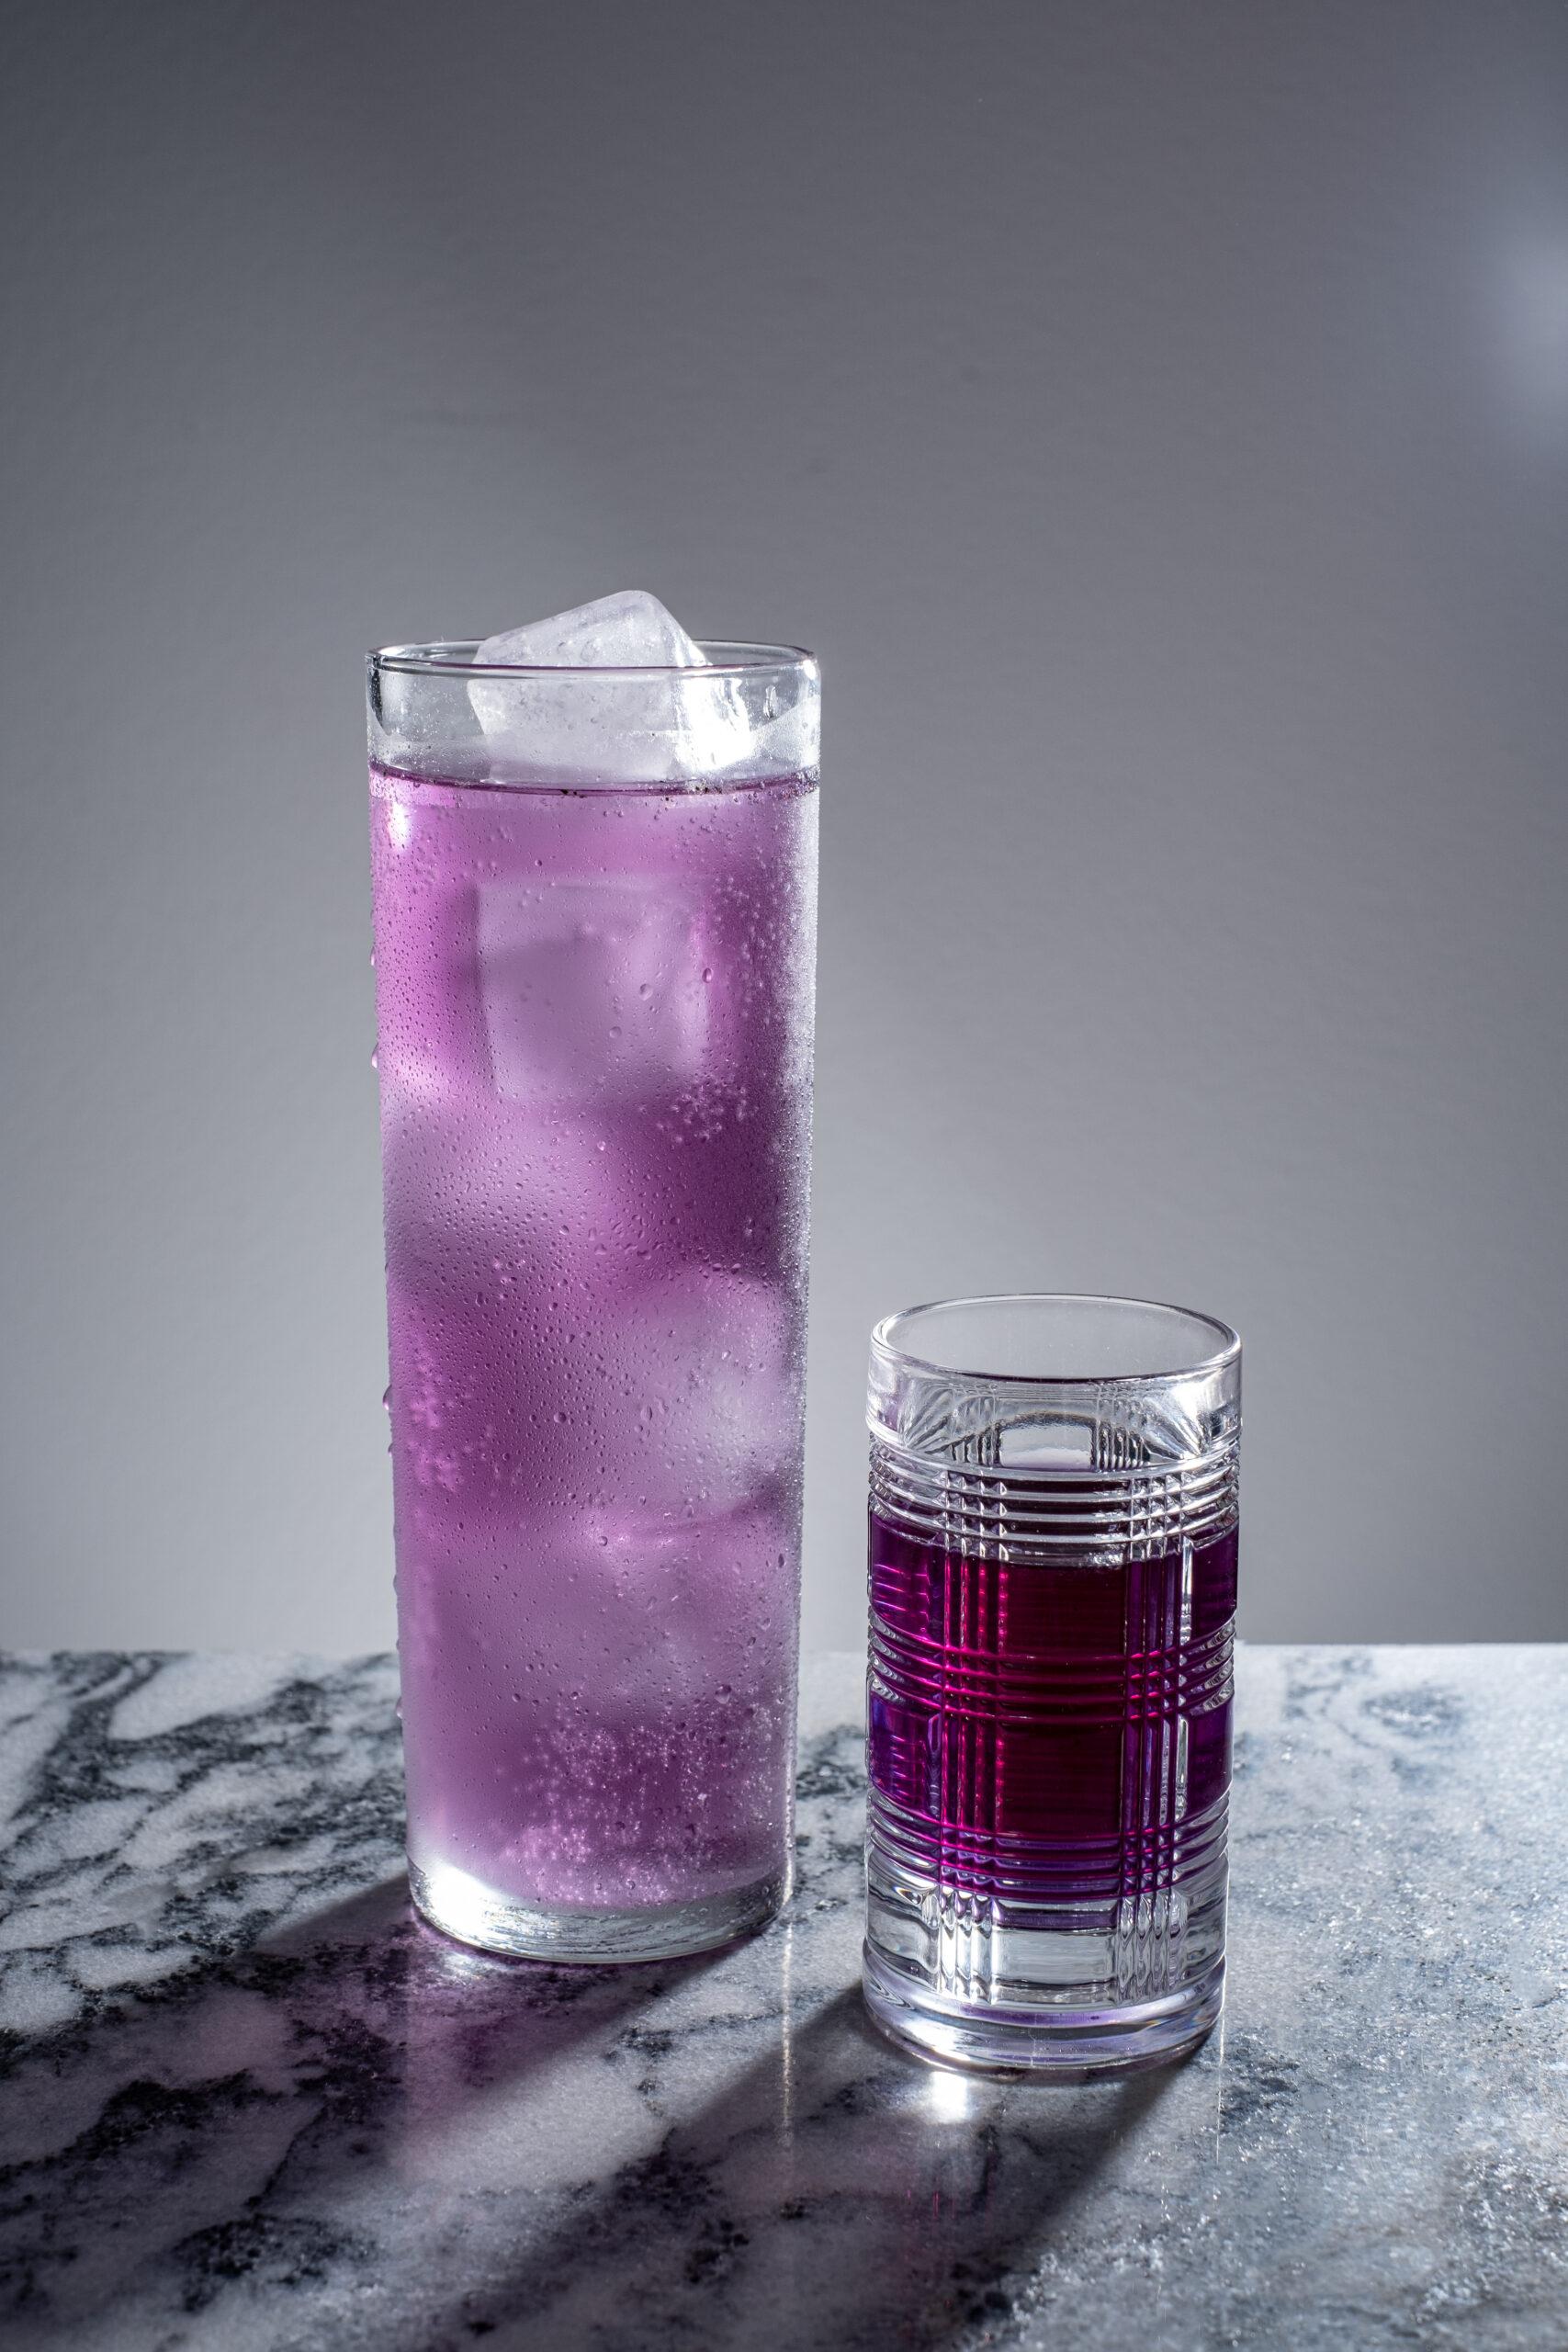 Artichoke Amaro and Tonic